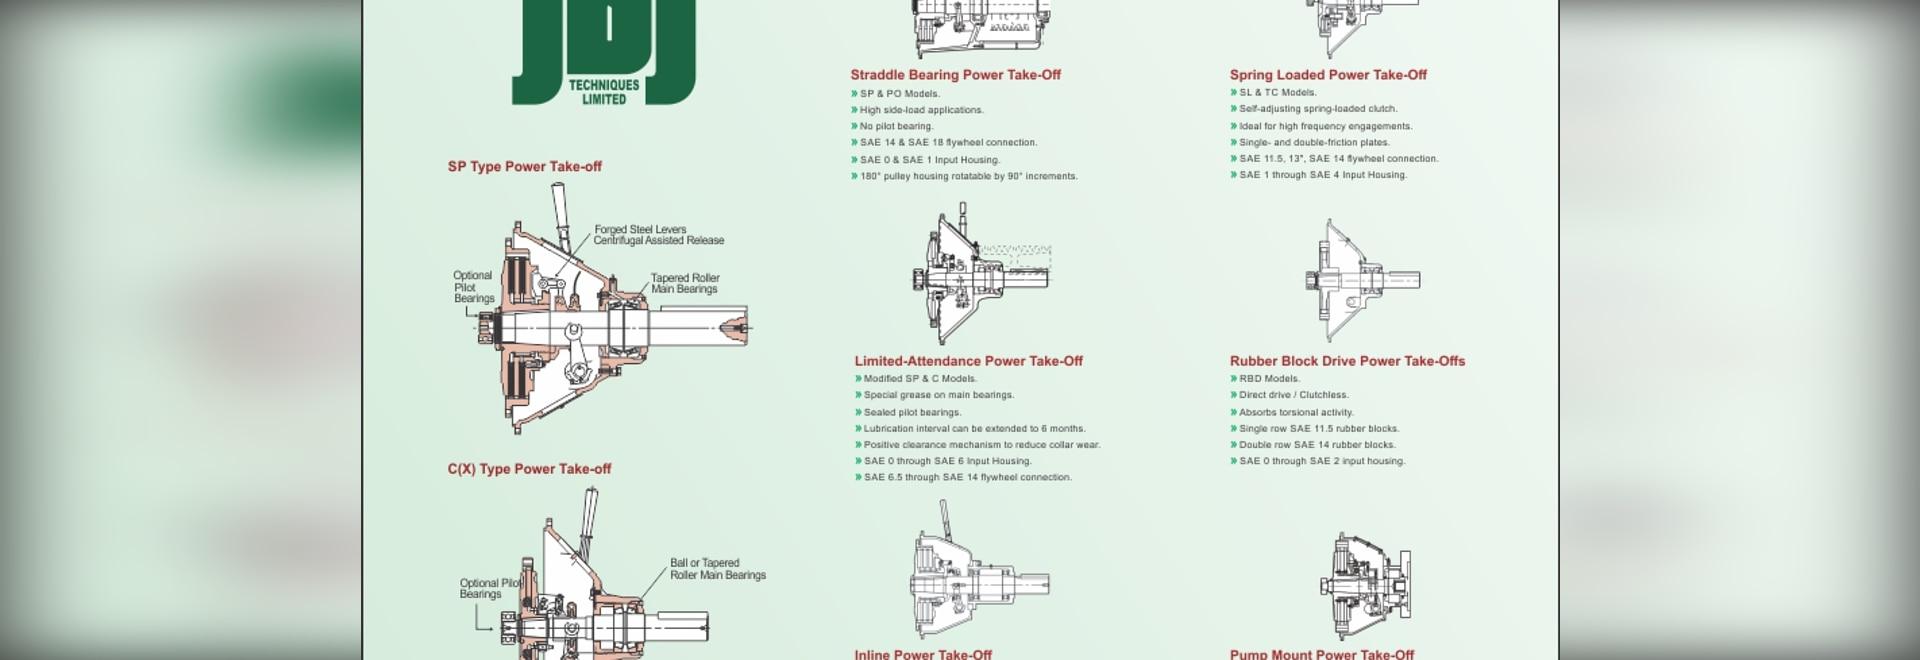 PTOs: Selecting a power take-off unit